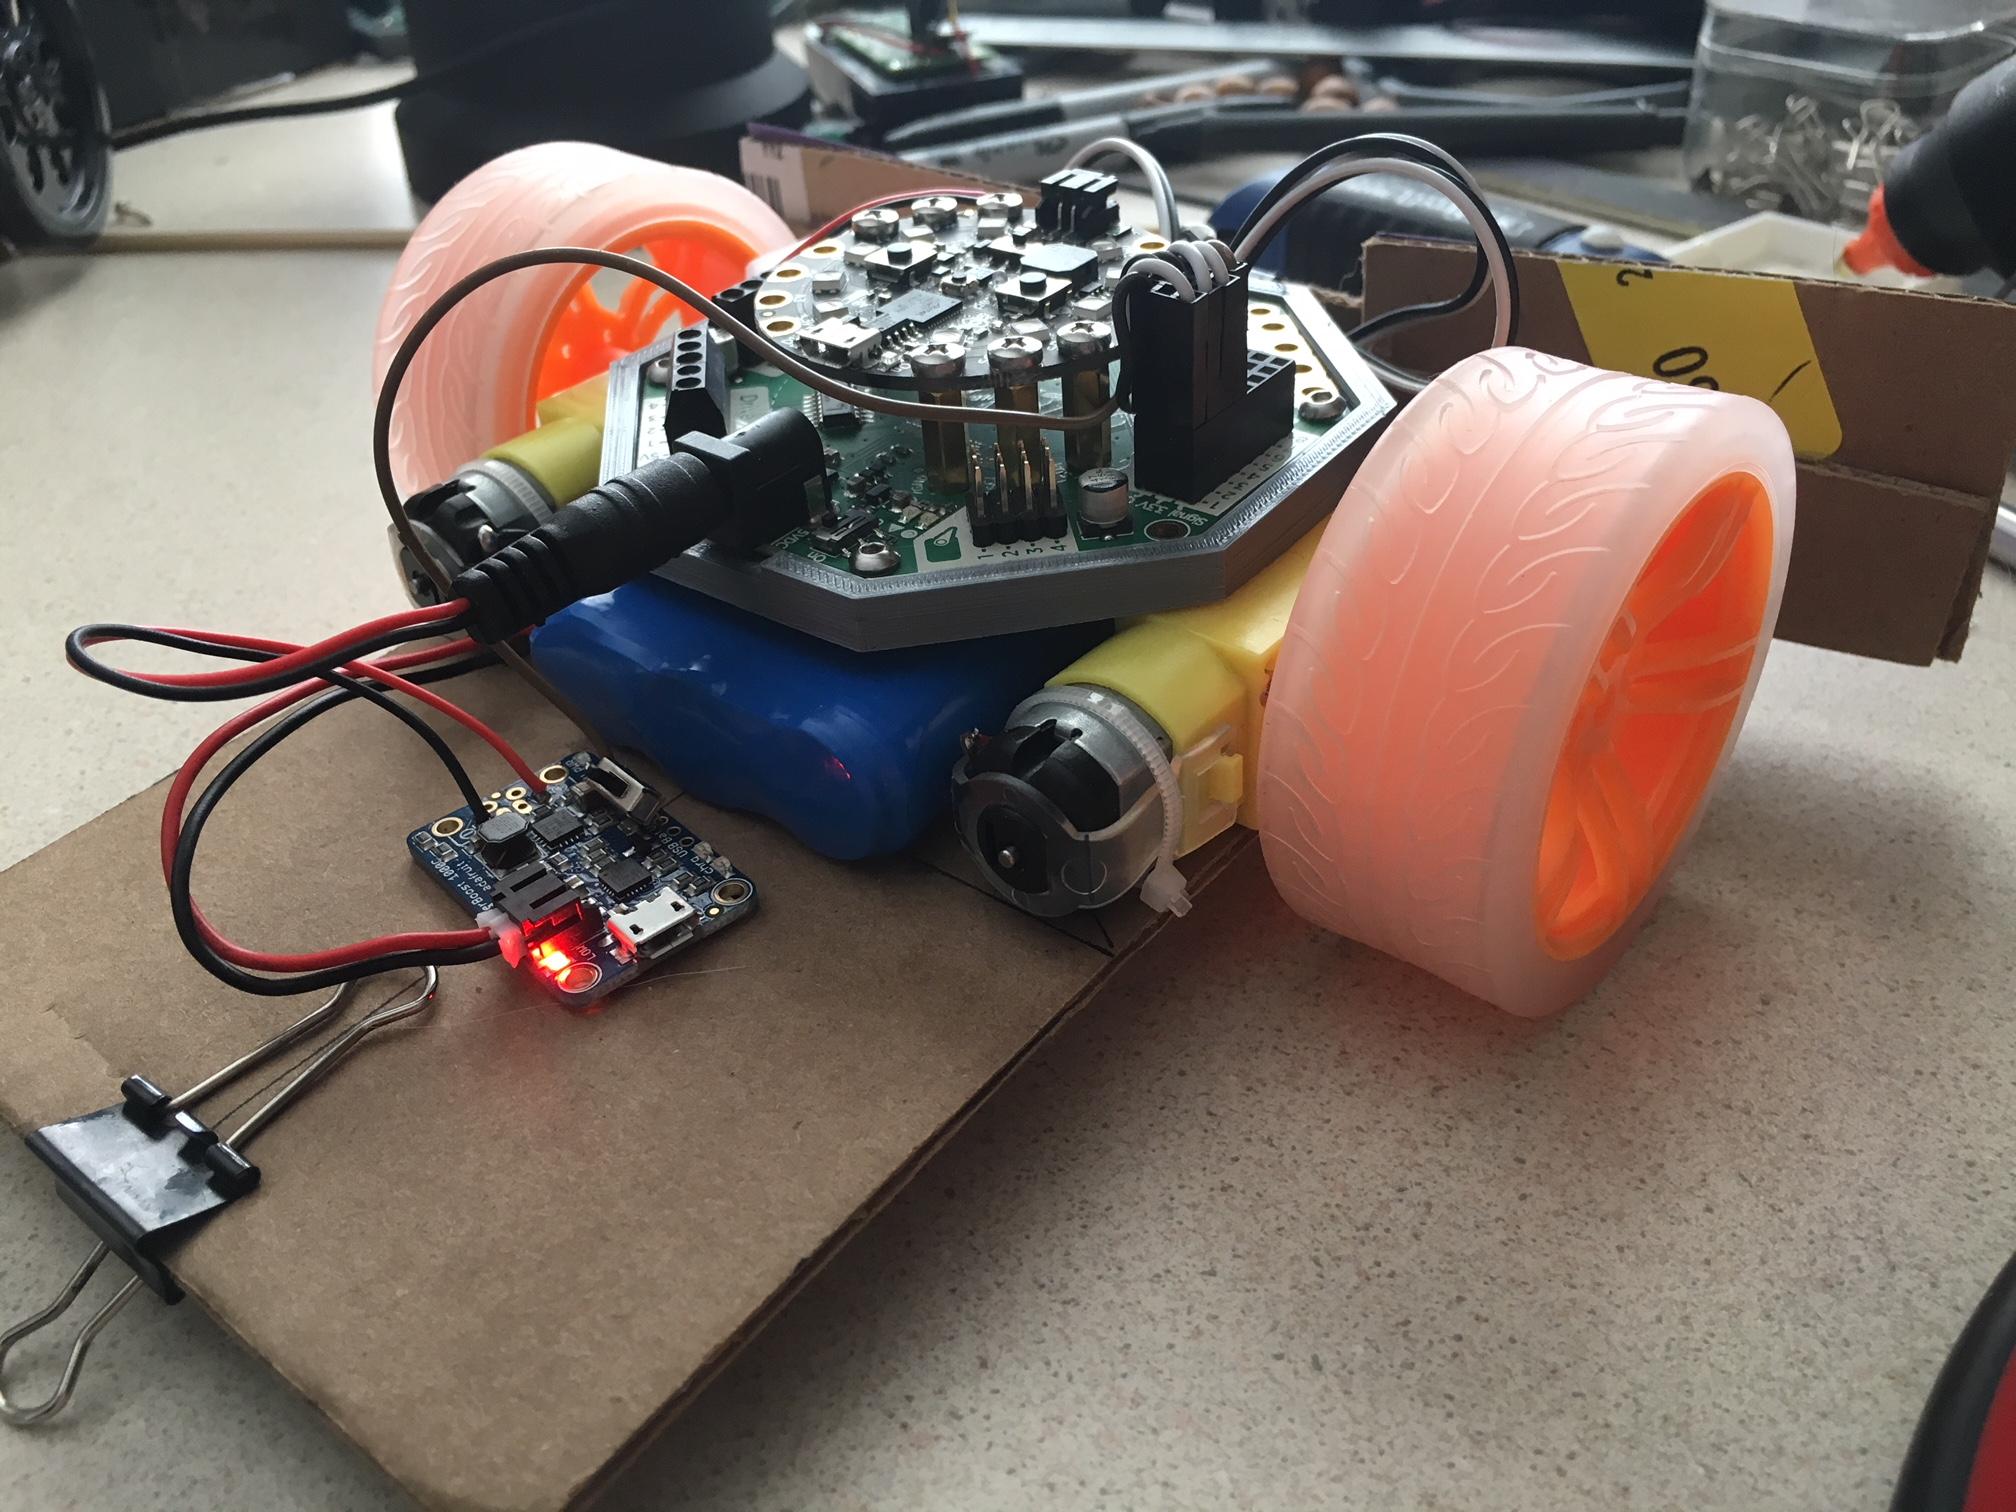 robotics___cnc_IMG_2266.jpg